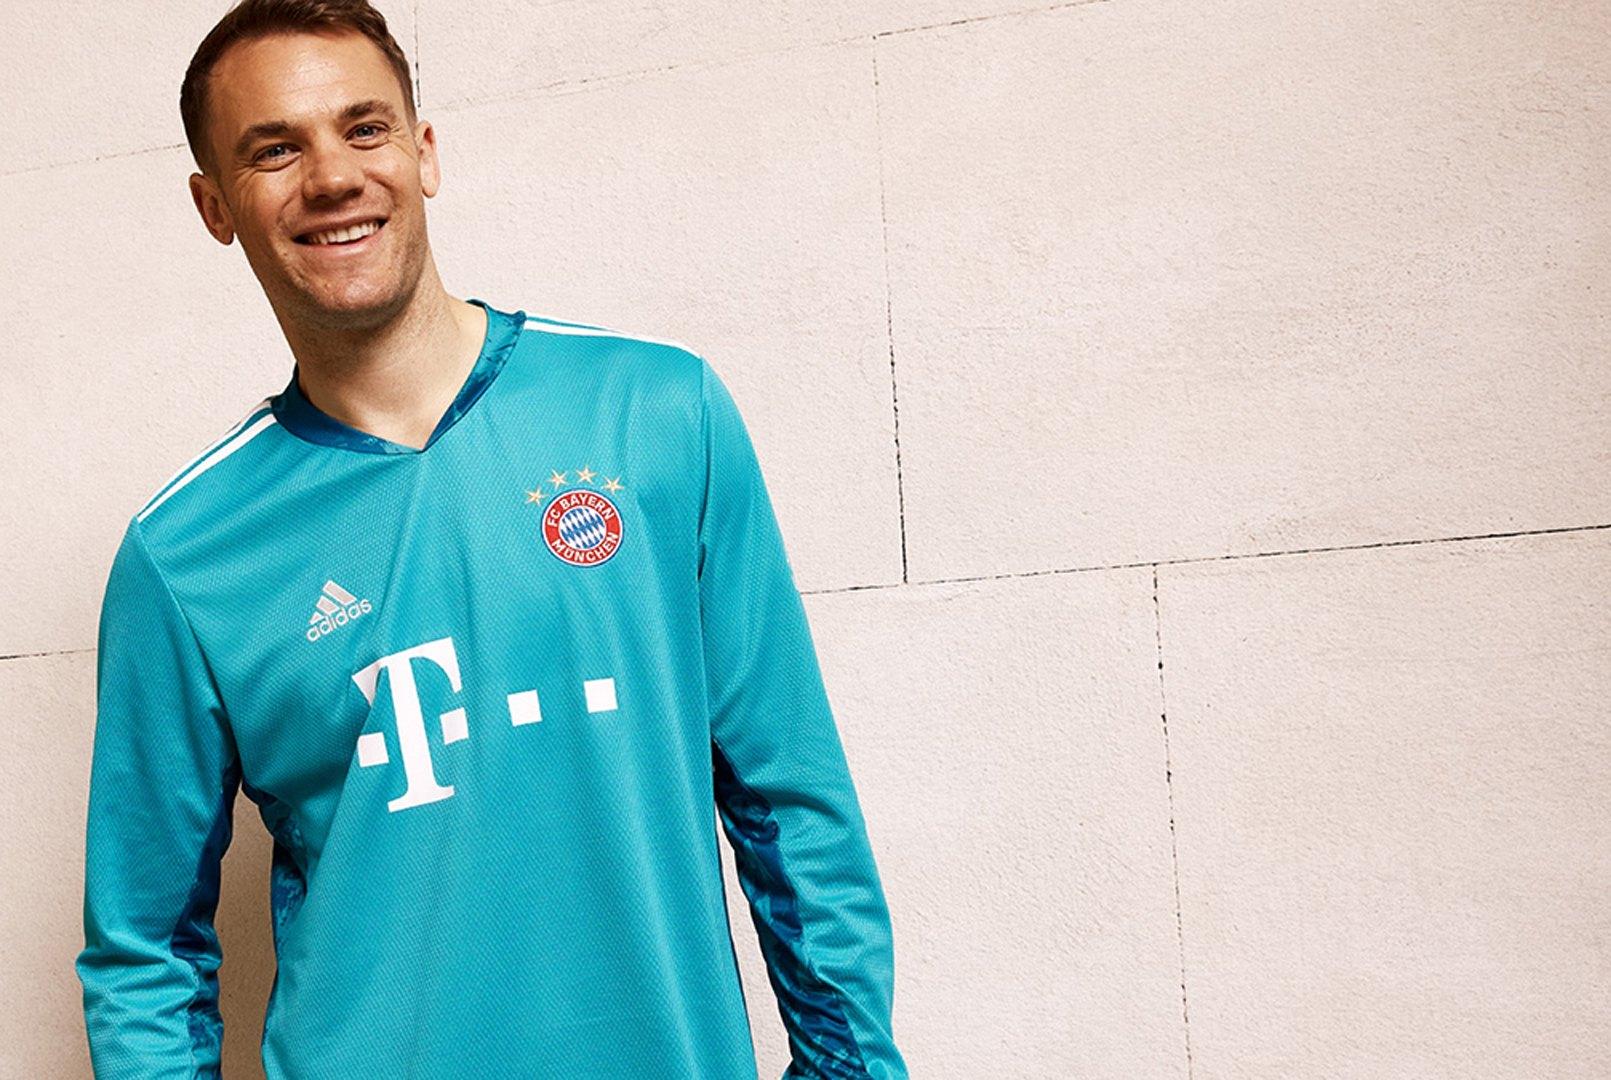 Camiseta titular (arquero) del Bayern Munich 2020/2021 | Imagen Adidas